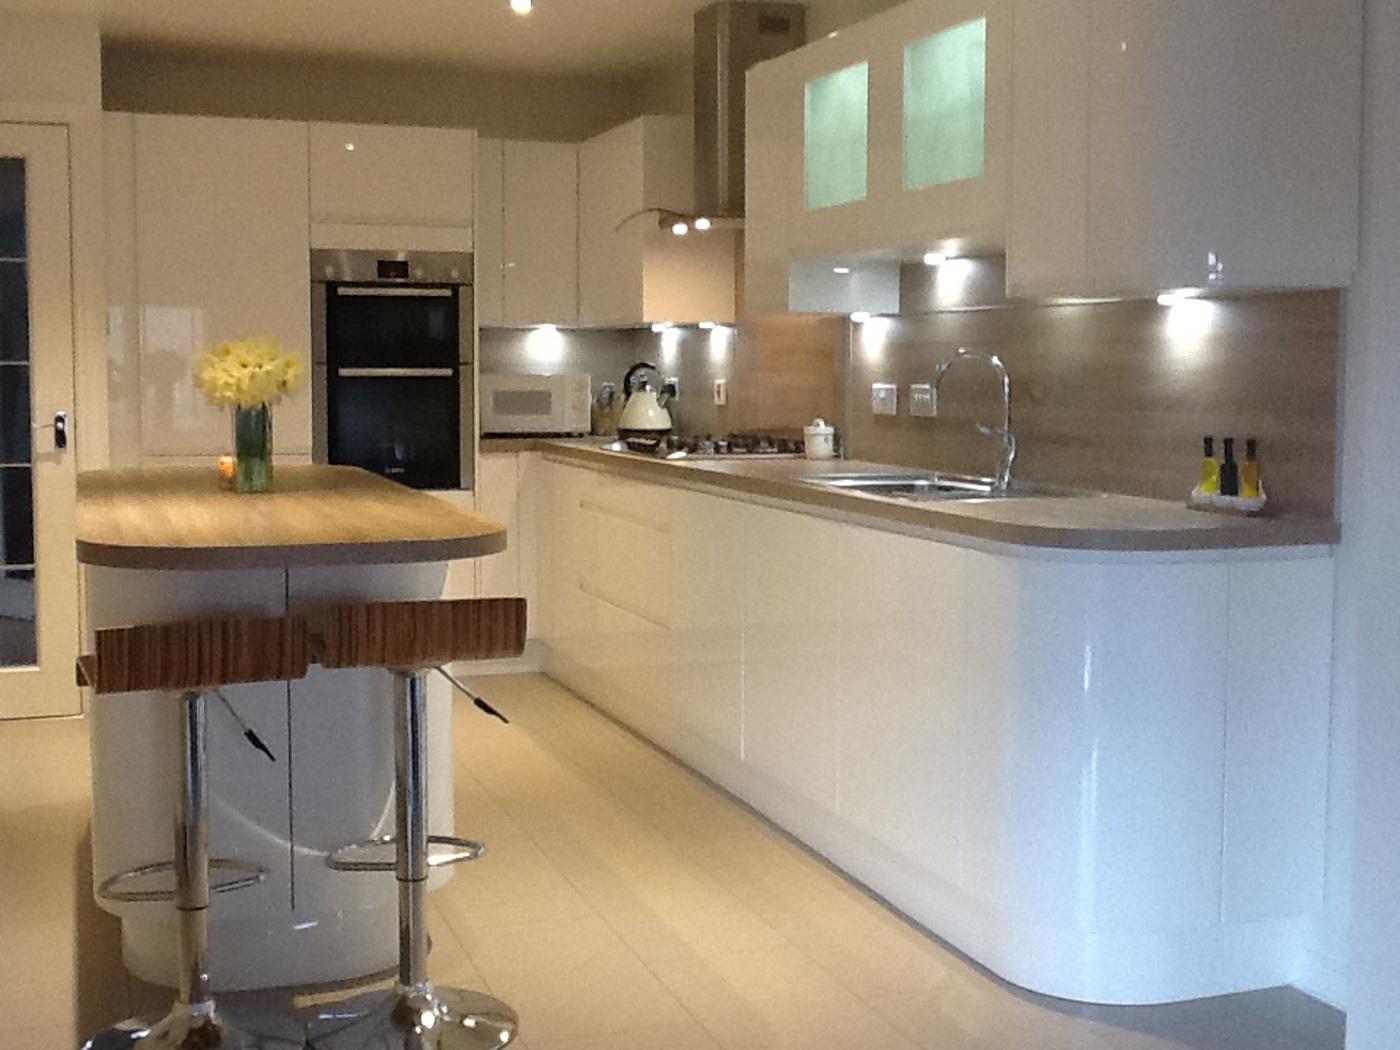 The finished handleless gloss kitchen